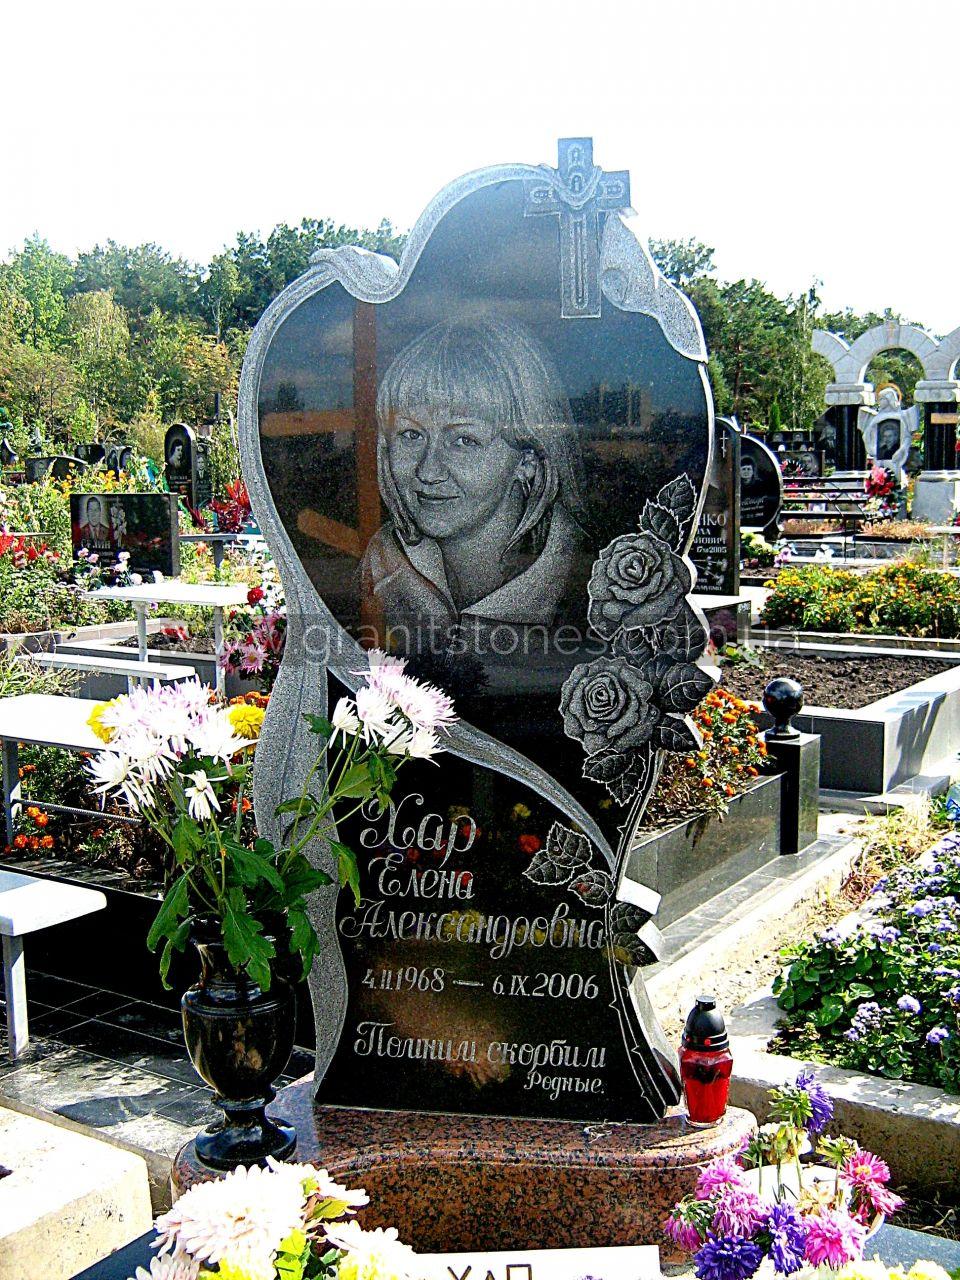 Памятник на могилу в виде сердца фото Лампадка из лезниковского гранита Технопарк